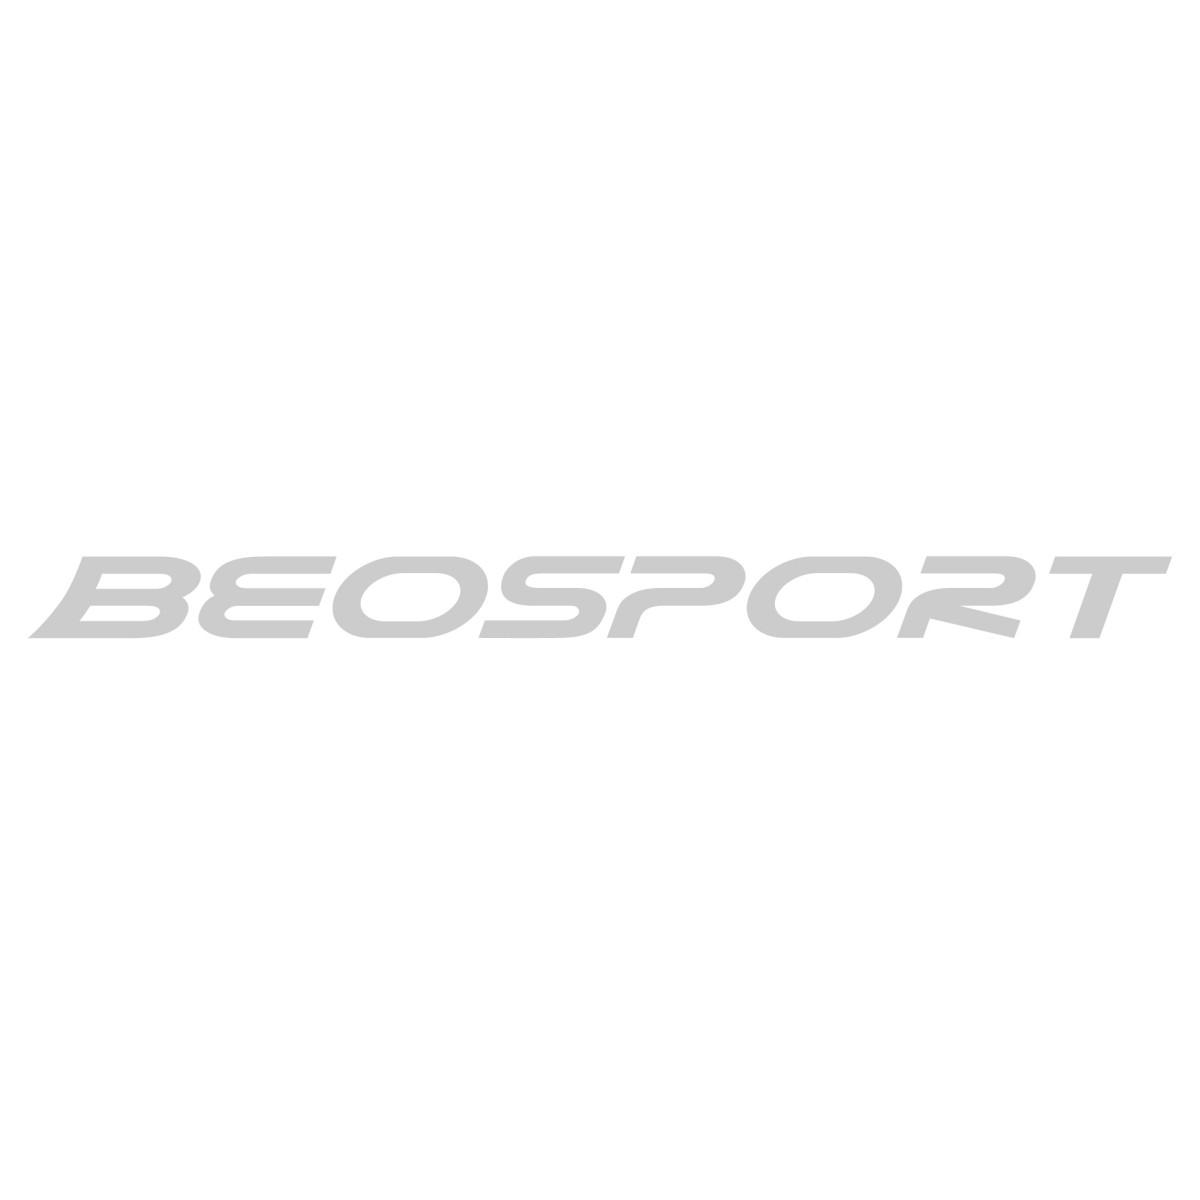 NBA DRV RECREATIONAL NET RWB